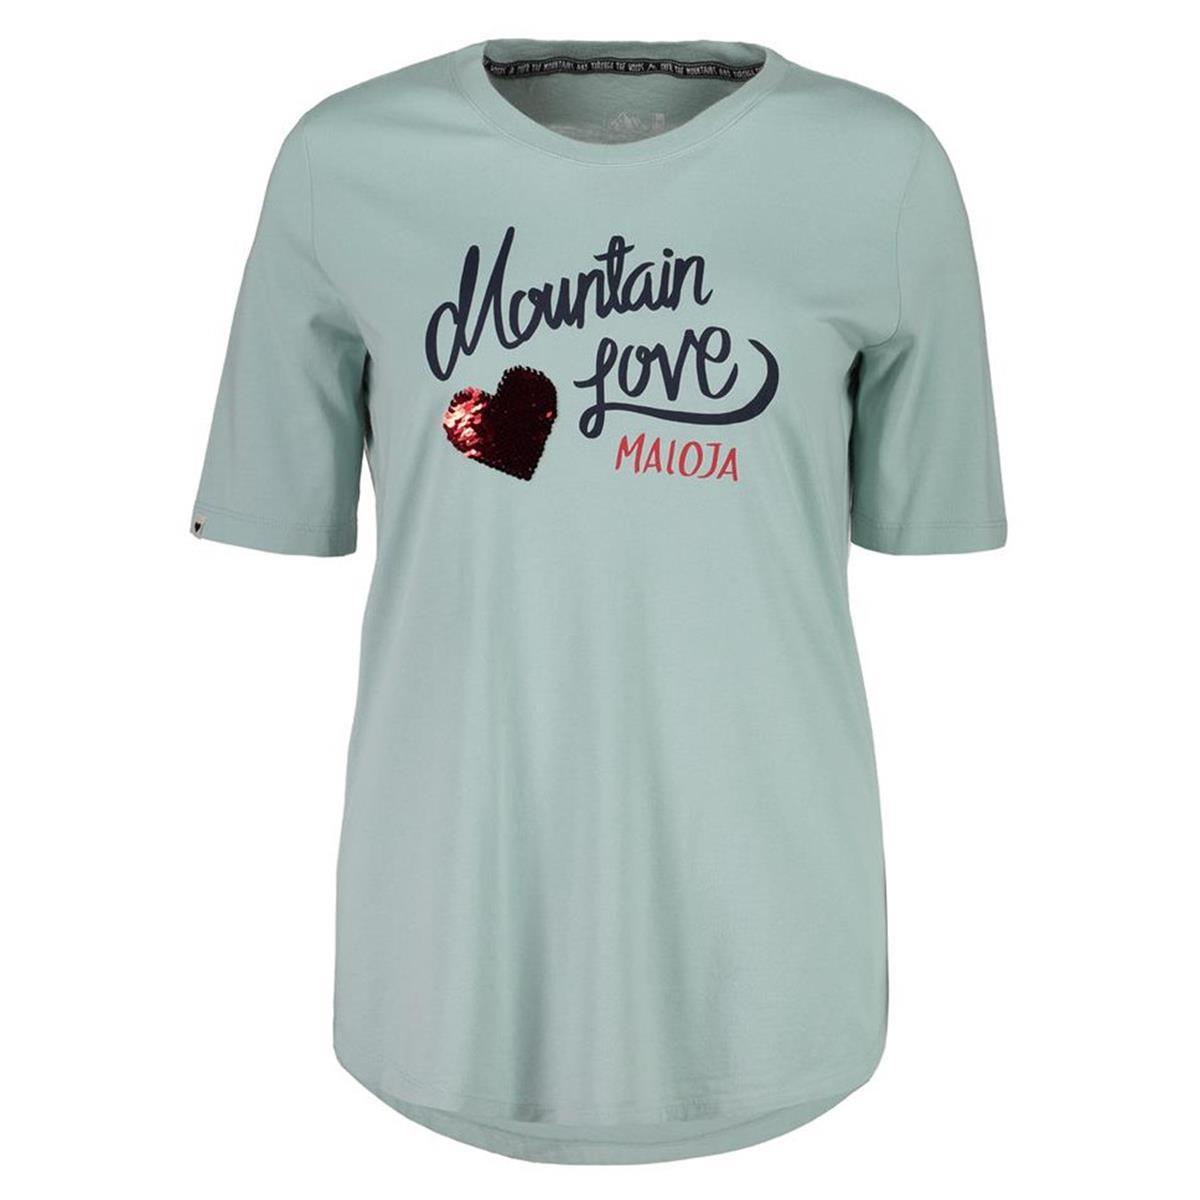 Maloja Girls T-Shirt CasacciaM. Cliff